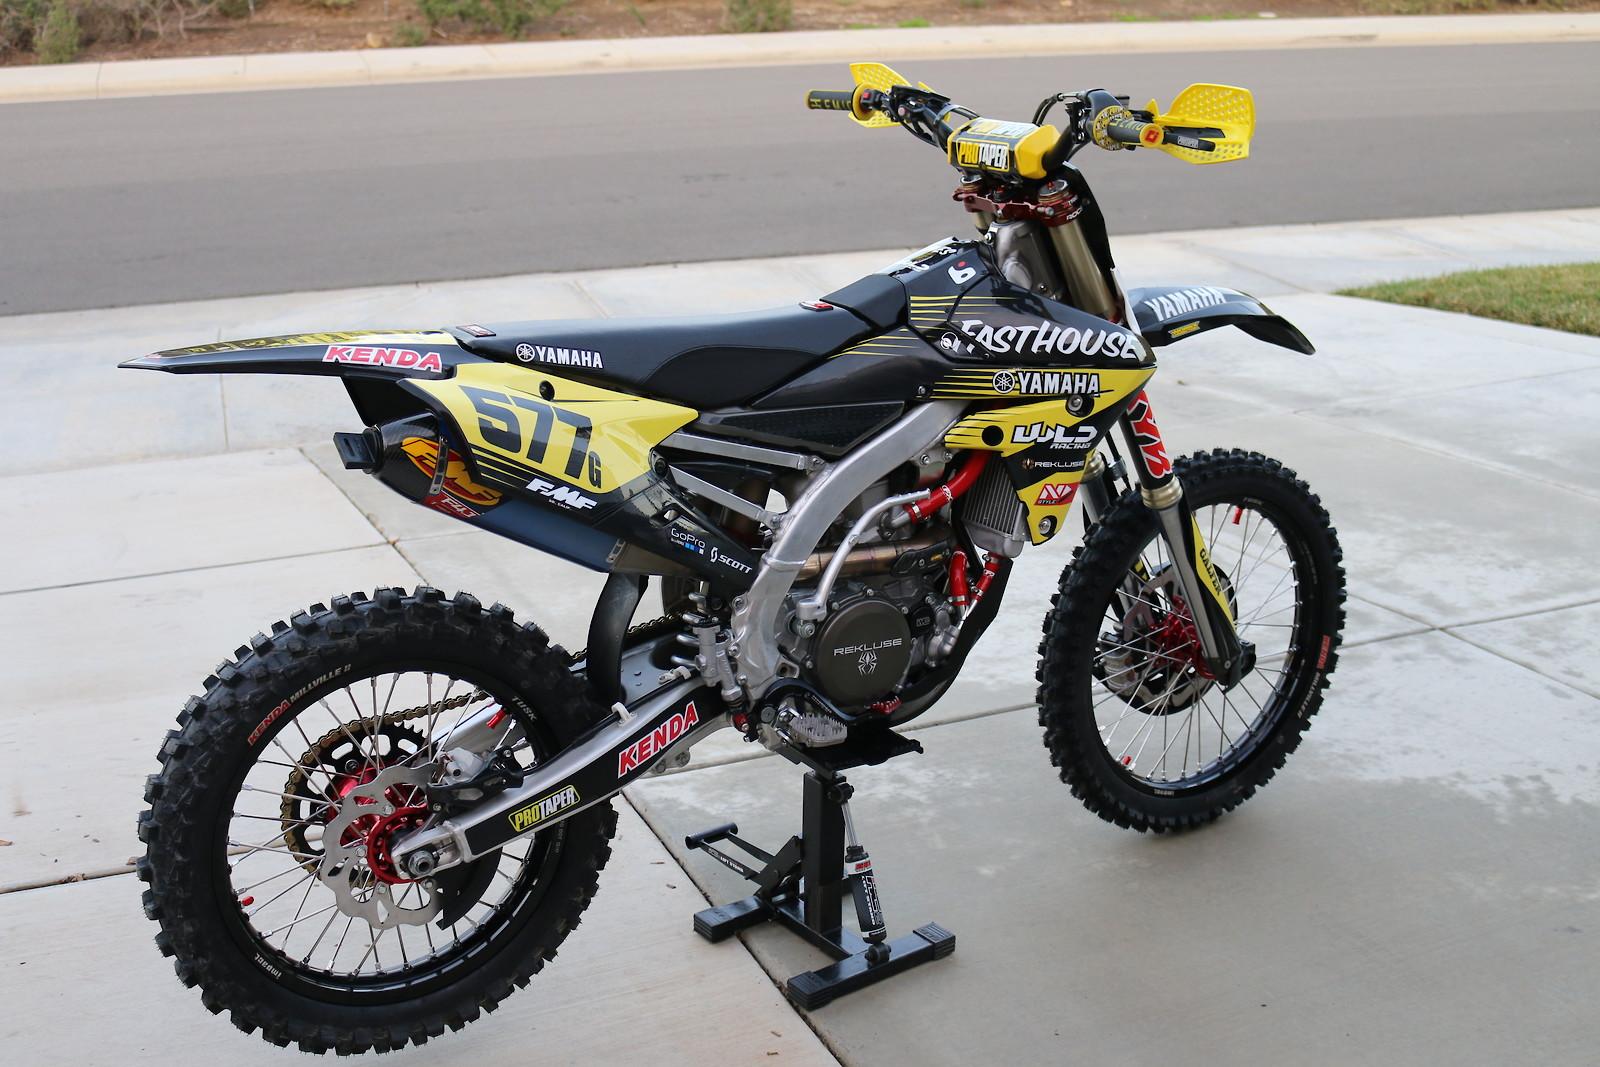 IMG 5892 - WLD - Motocross Pictures - Vital MX